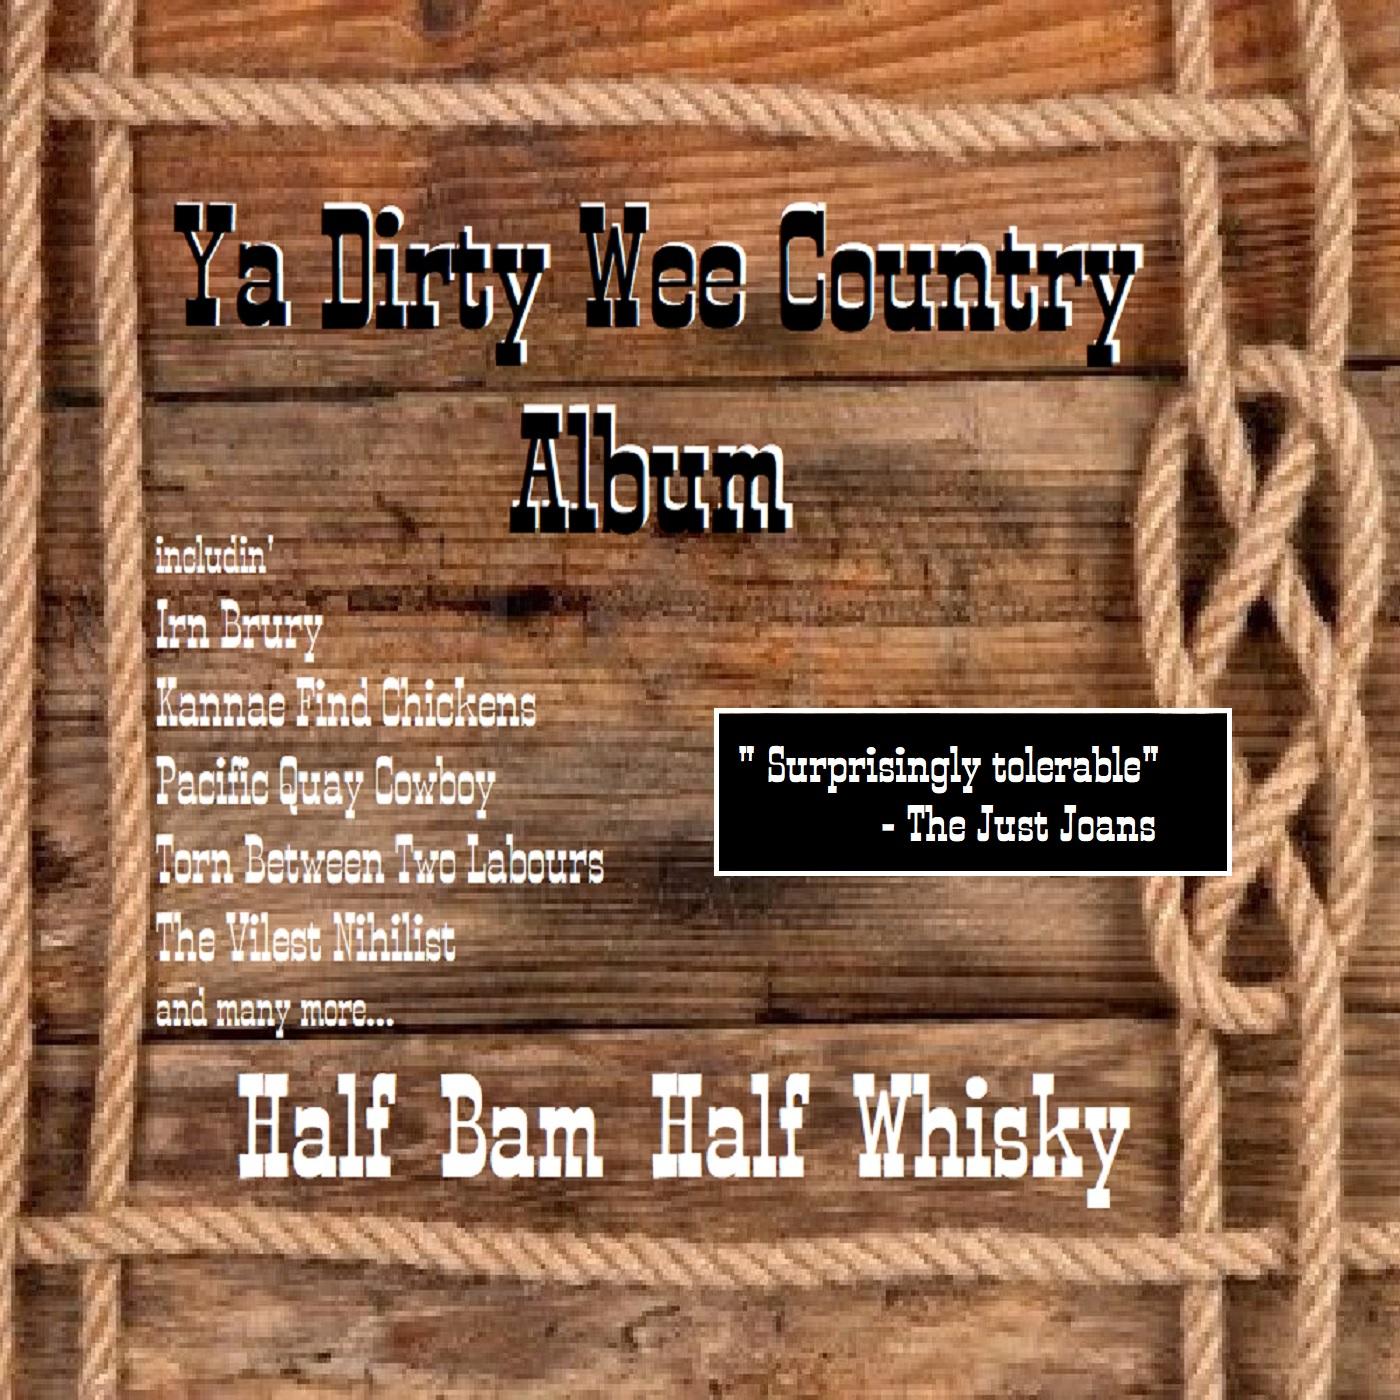 Ya Dirty Wee Country Album